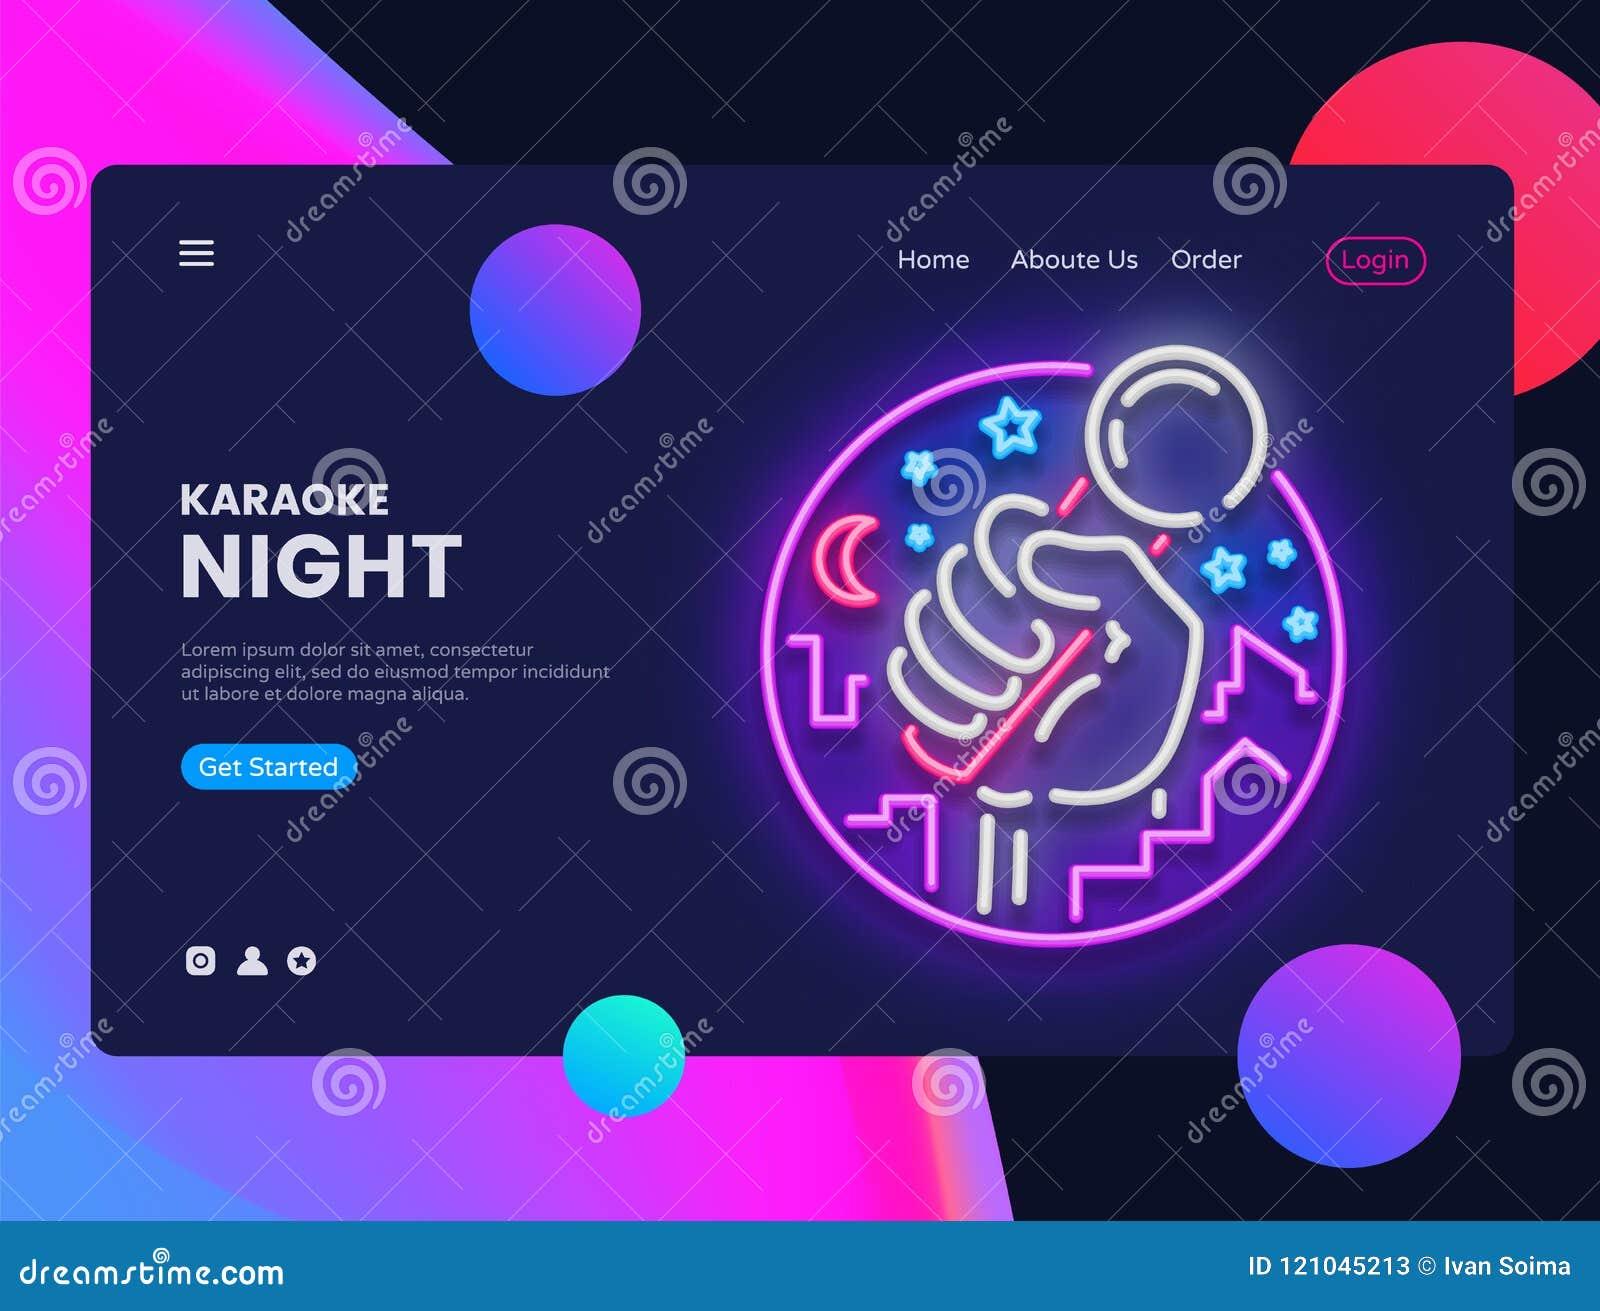 Karaoke Neon Horizontal Web Banner Vector. Live Music Advertising banner web interface in modern trend design, neon